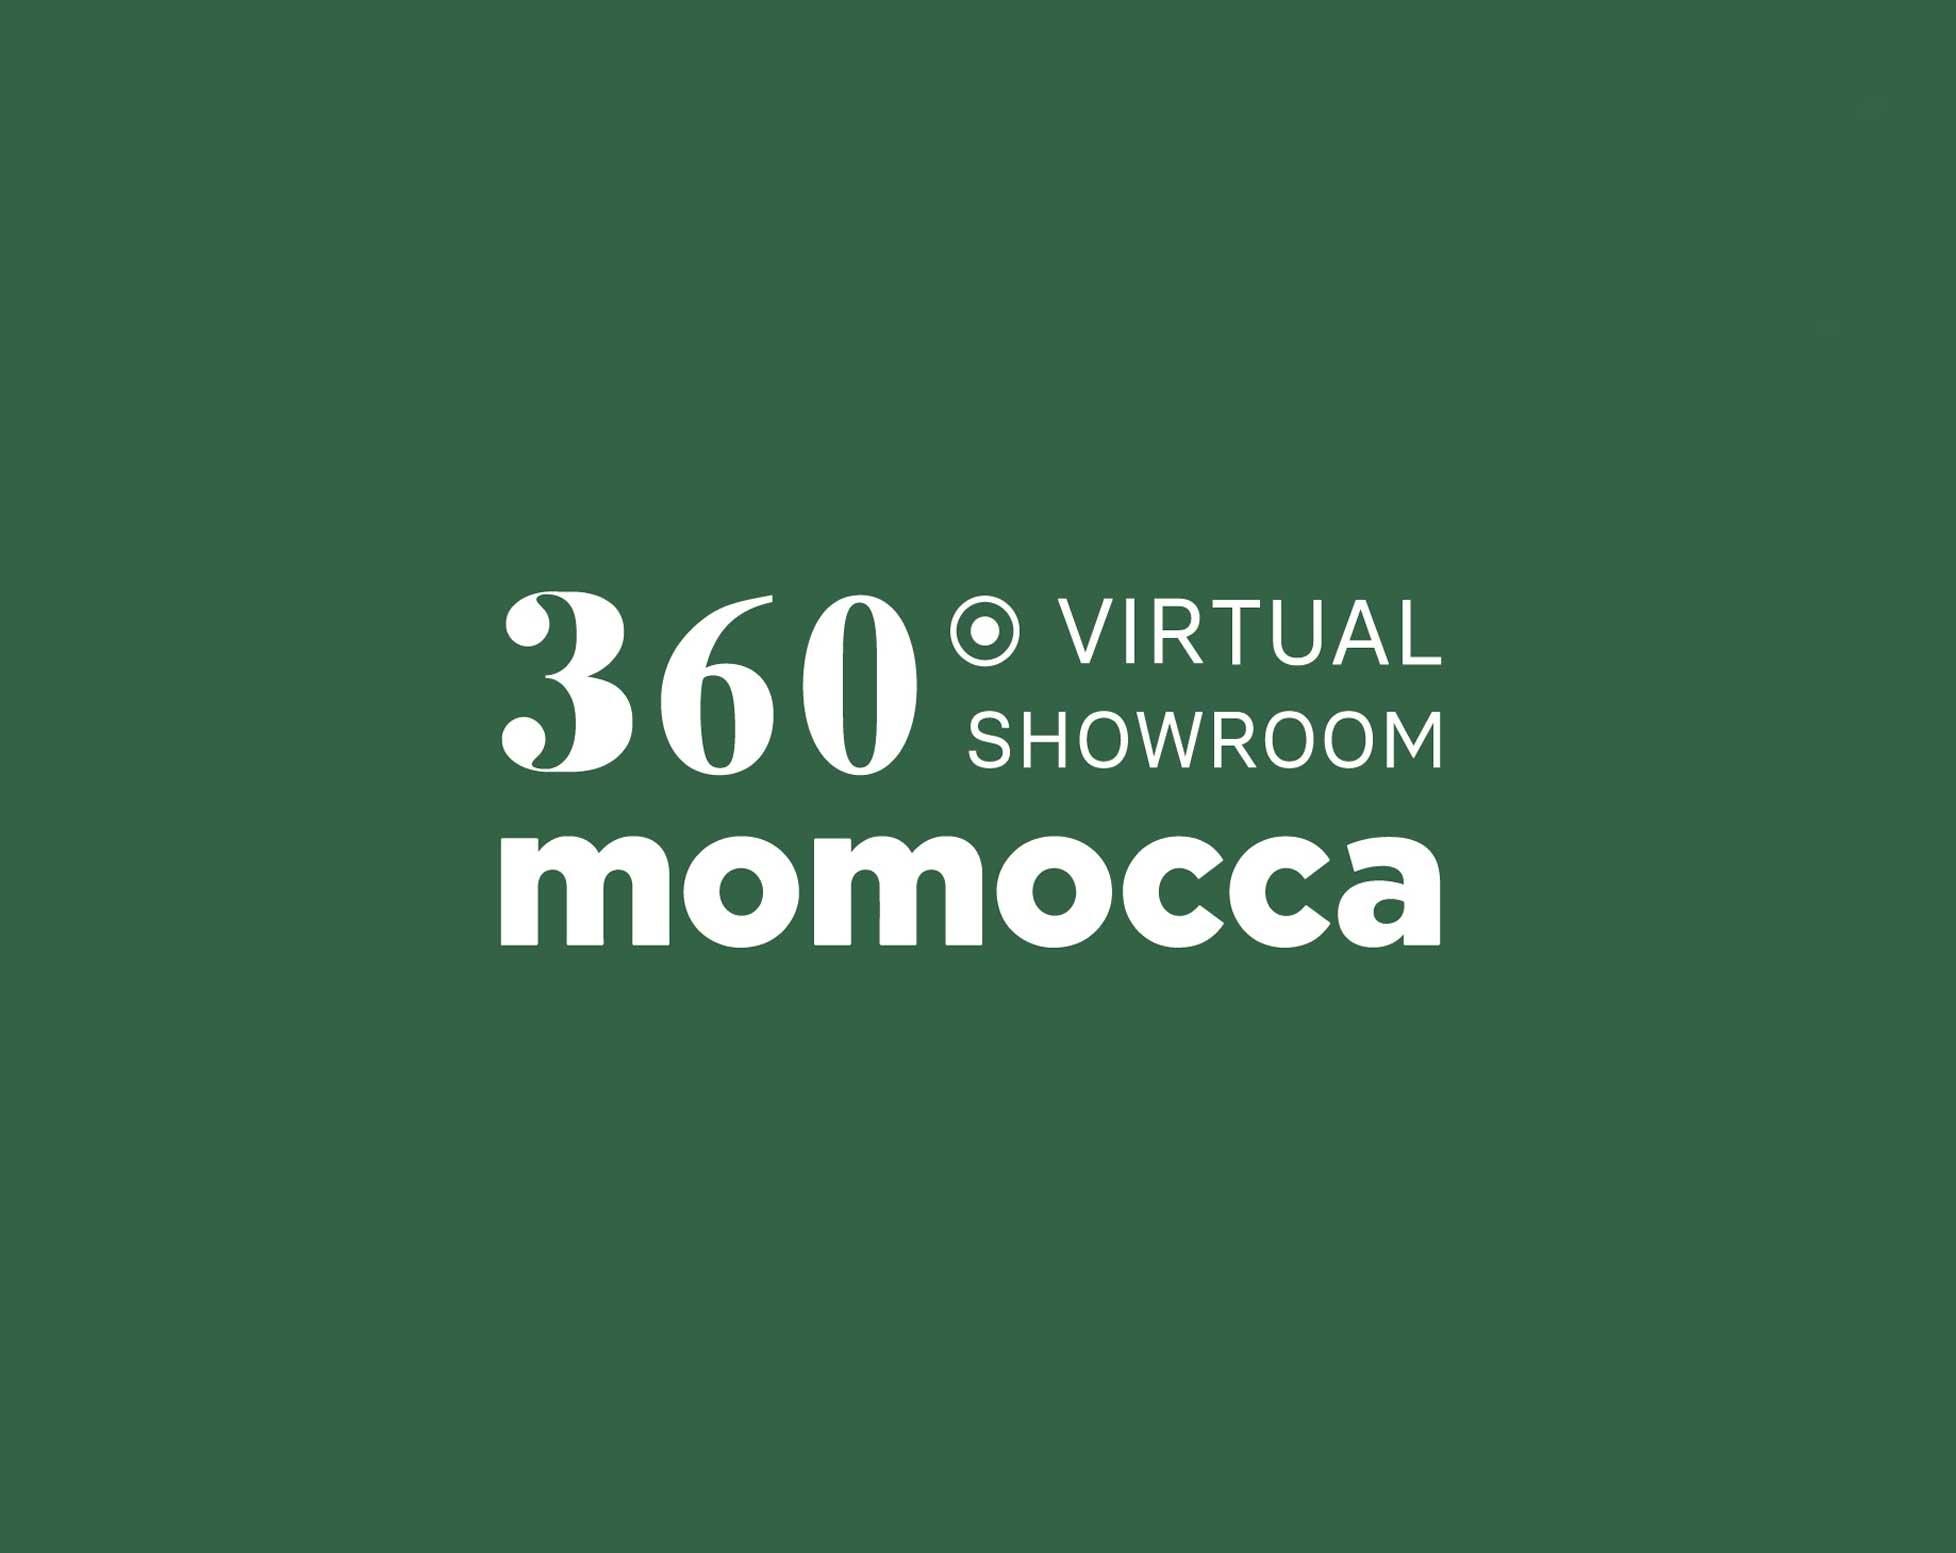 momocca showroom virtual